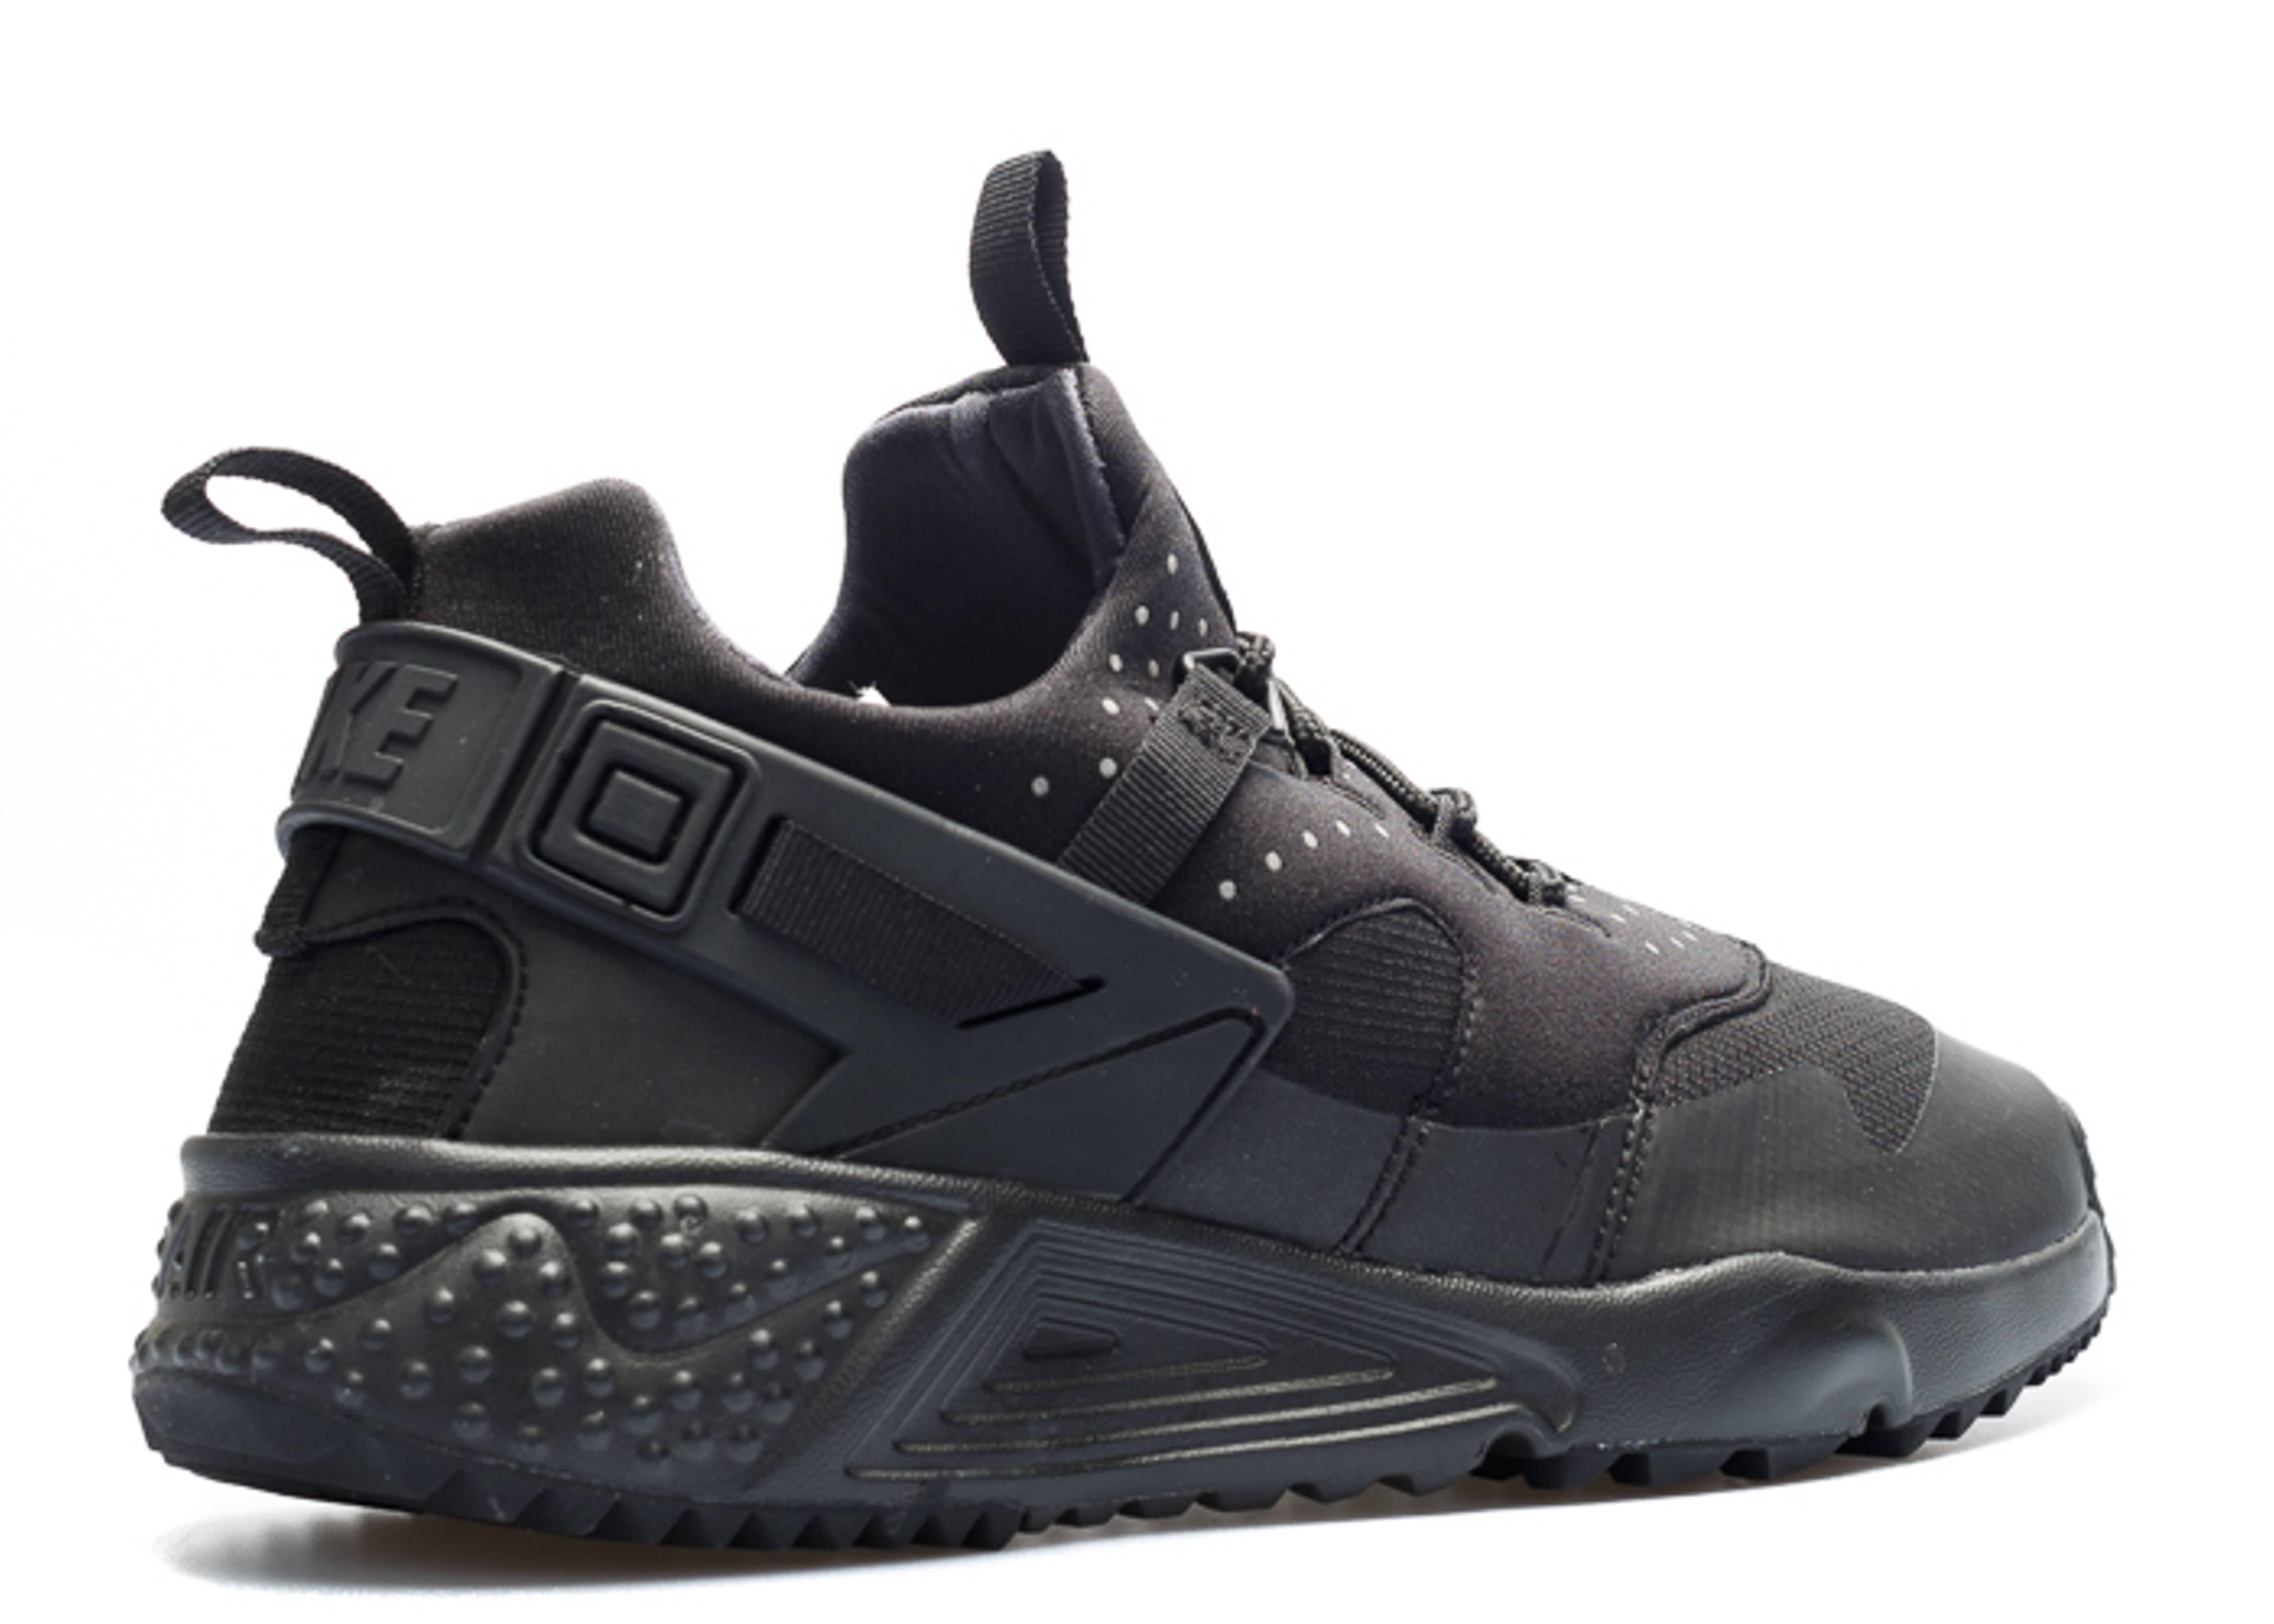 finest selection a0492 130aa Nike Air Huarache Utility - Nike - 806807 002 - black/black black | Flight  Club